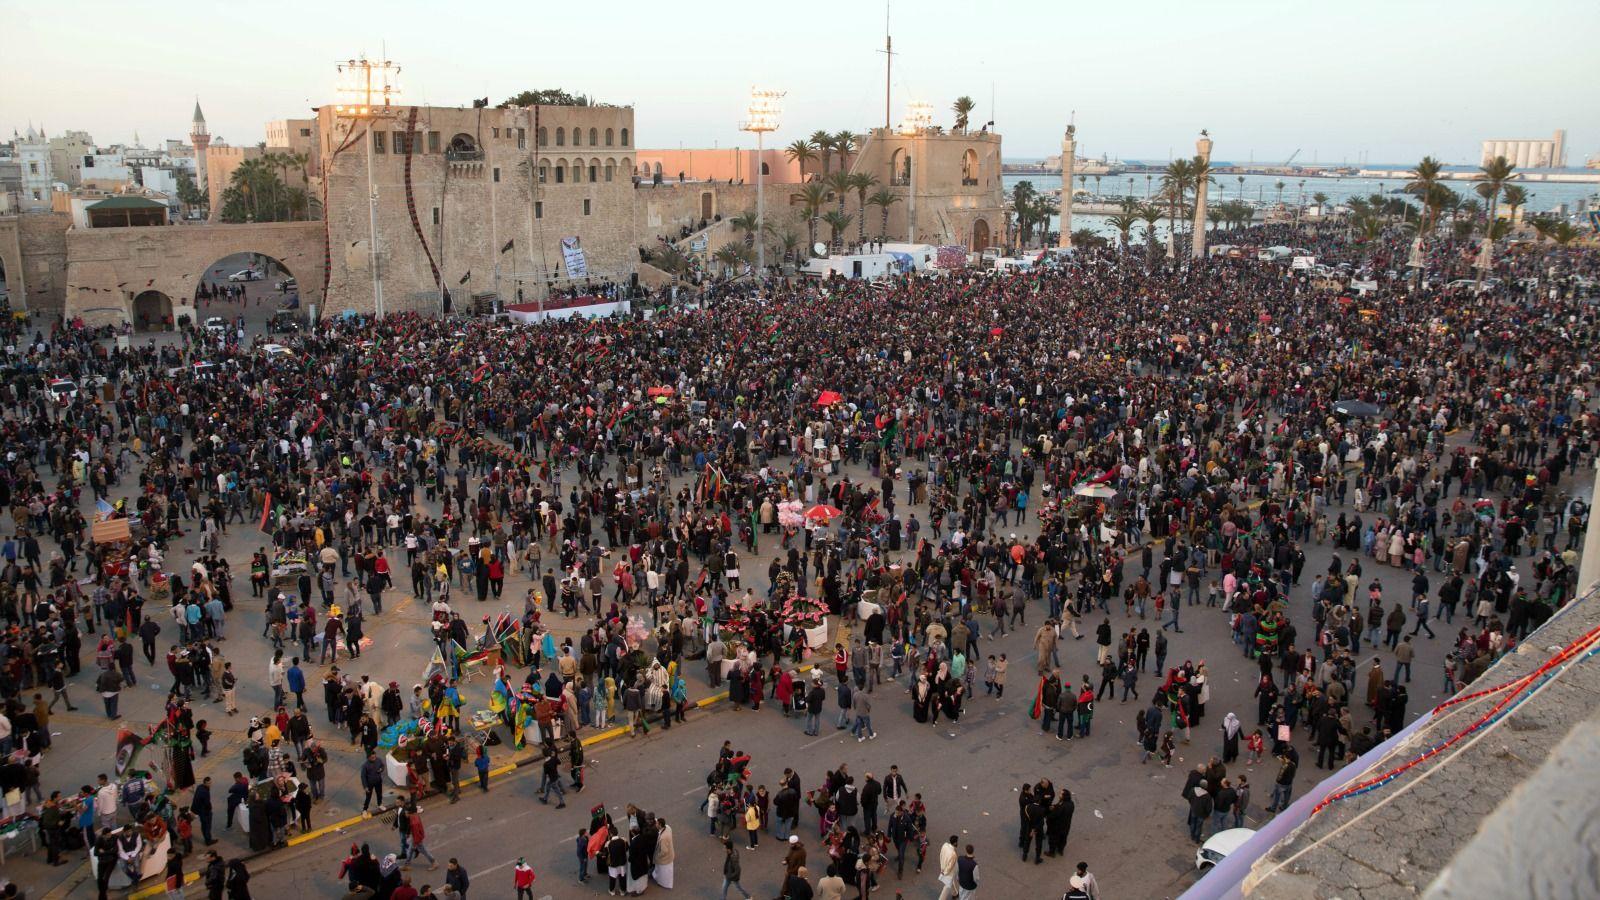 Russia Plays Games For Fun In Libya Euractiv Com